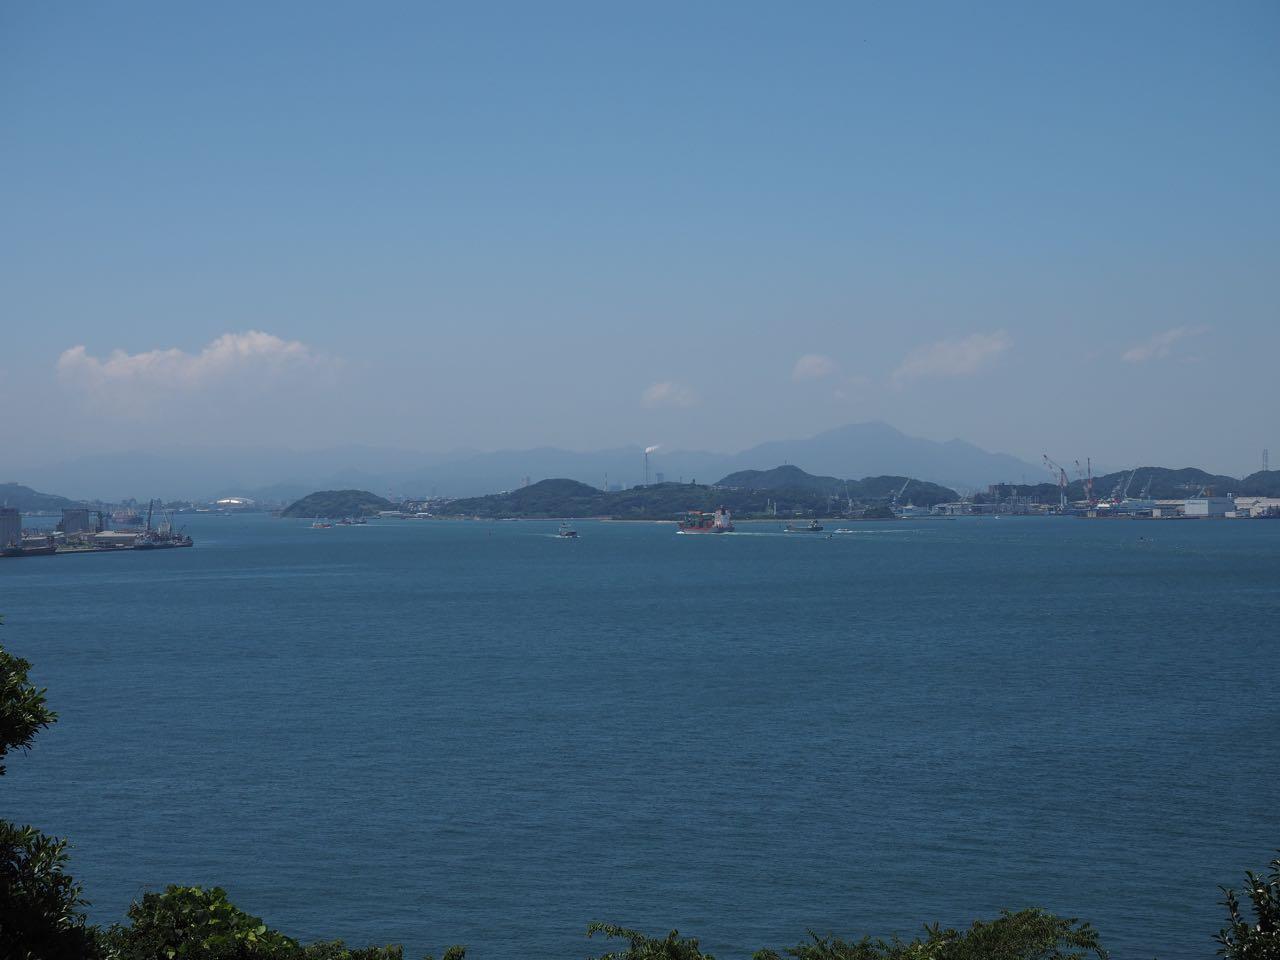 The view of Shimonoseki, Honshu from Mekari PA